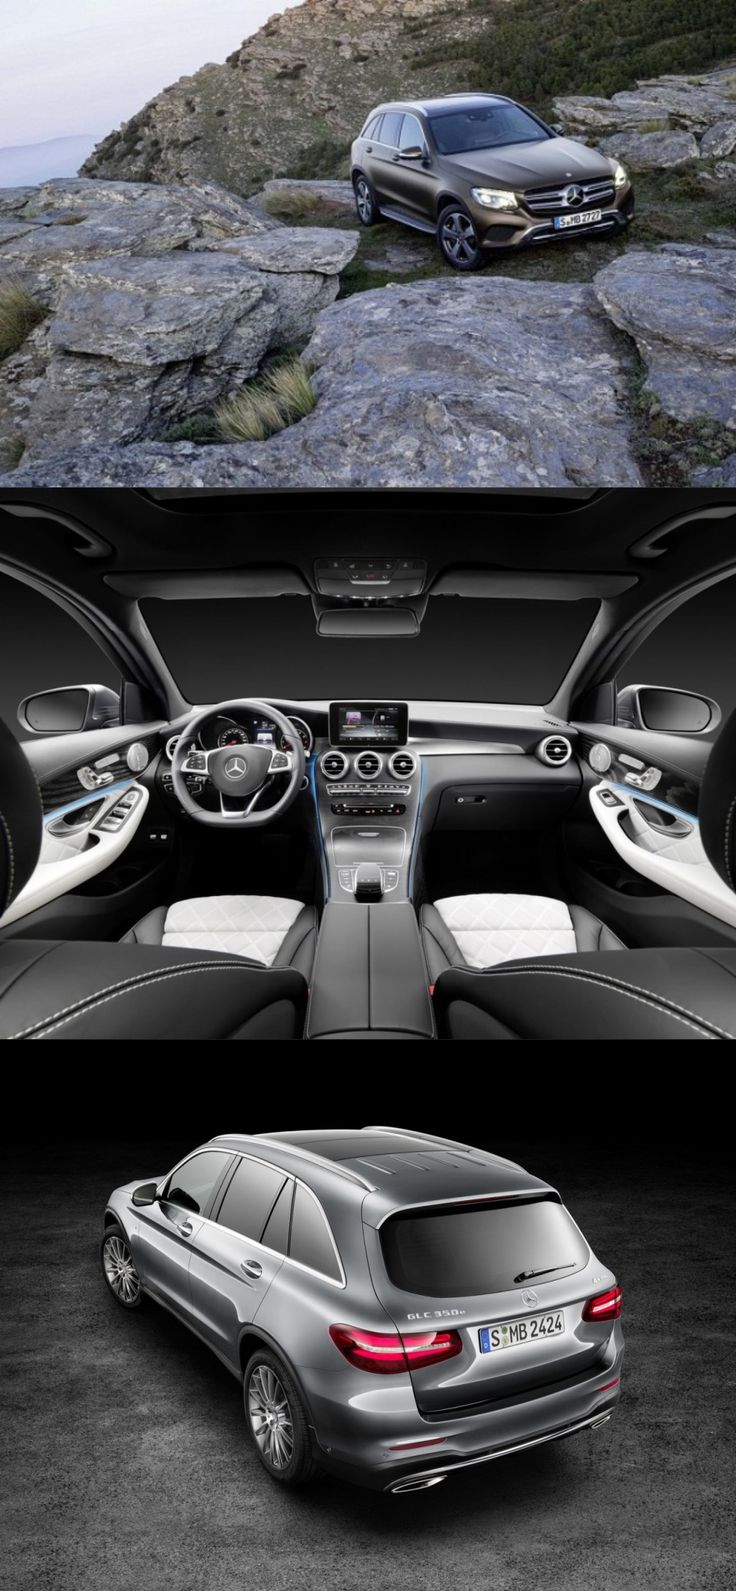 52 best images about mercedes glc on pinterest cars 4x4 and engine. Black Bedroom Furniture Sets. Home Design Ideas